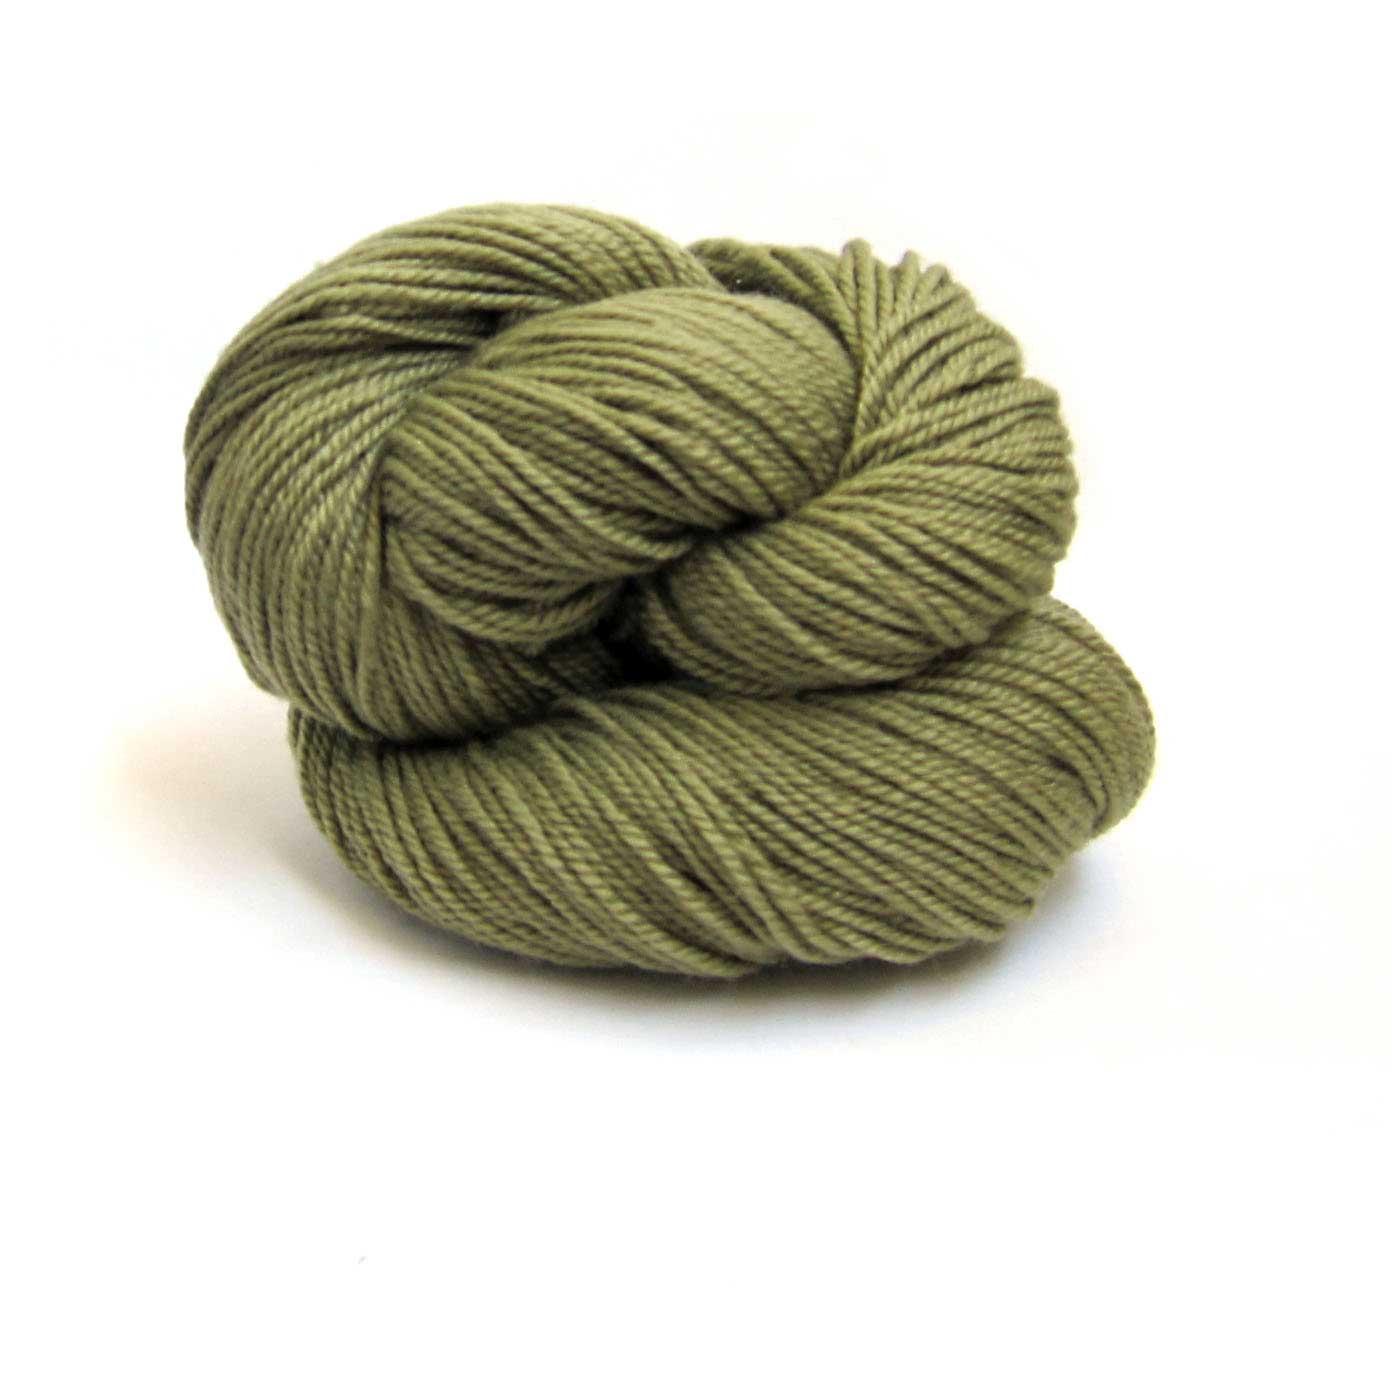 Olive Louet Gems 100% Merino Superwash Yarn